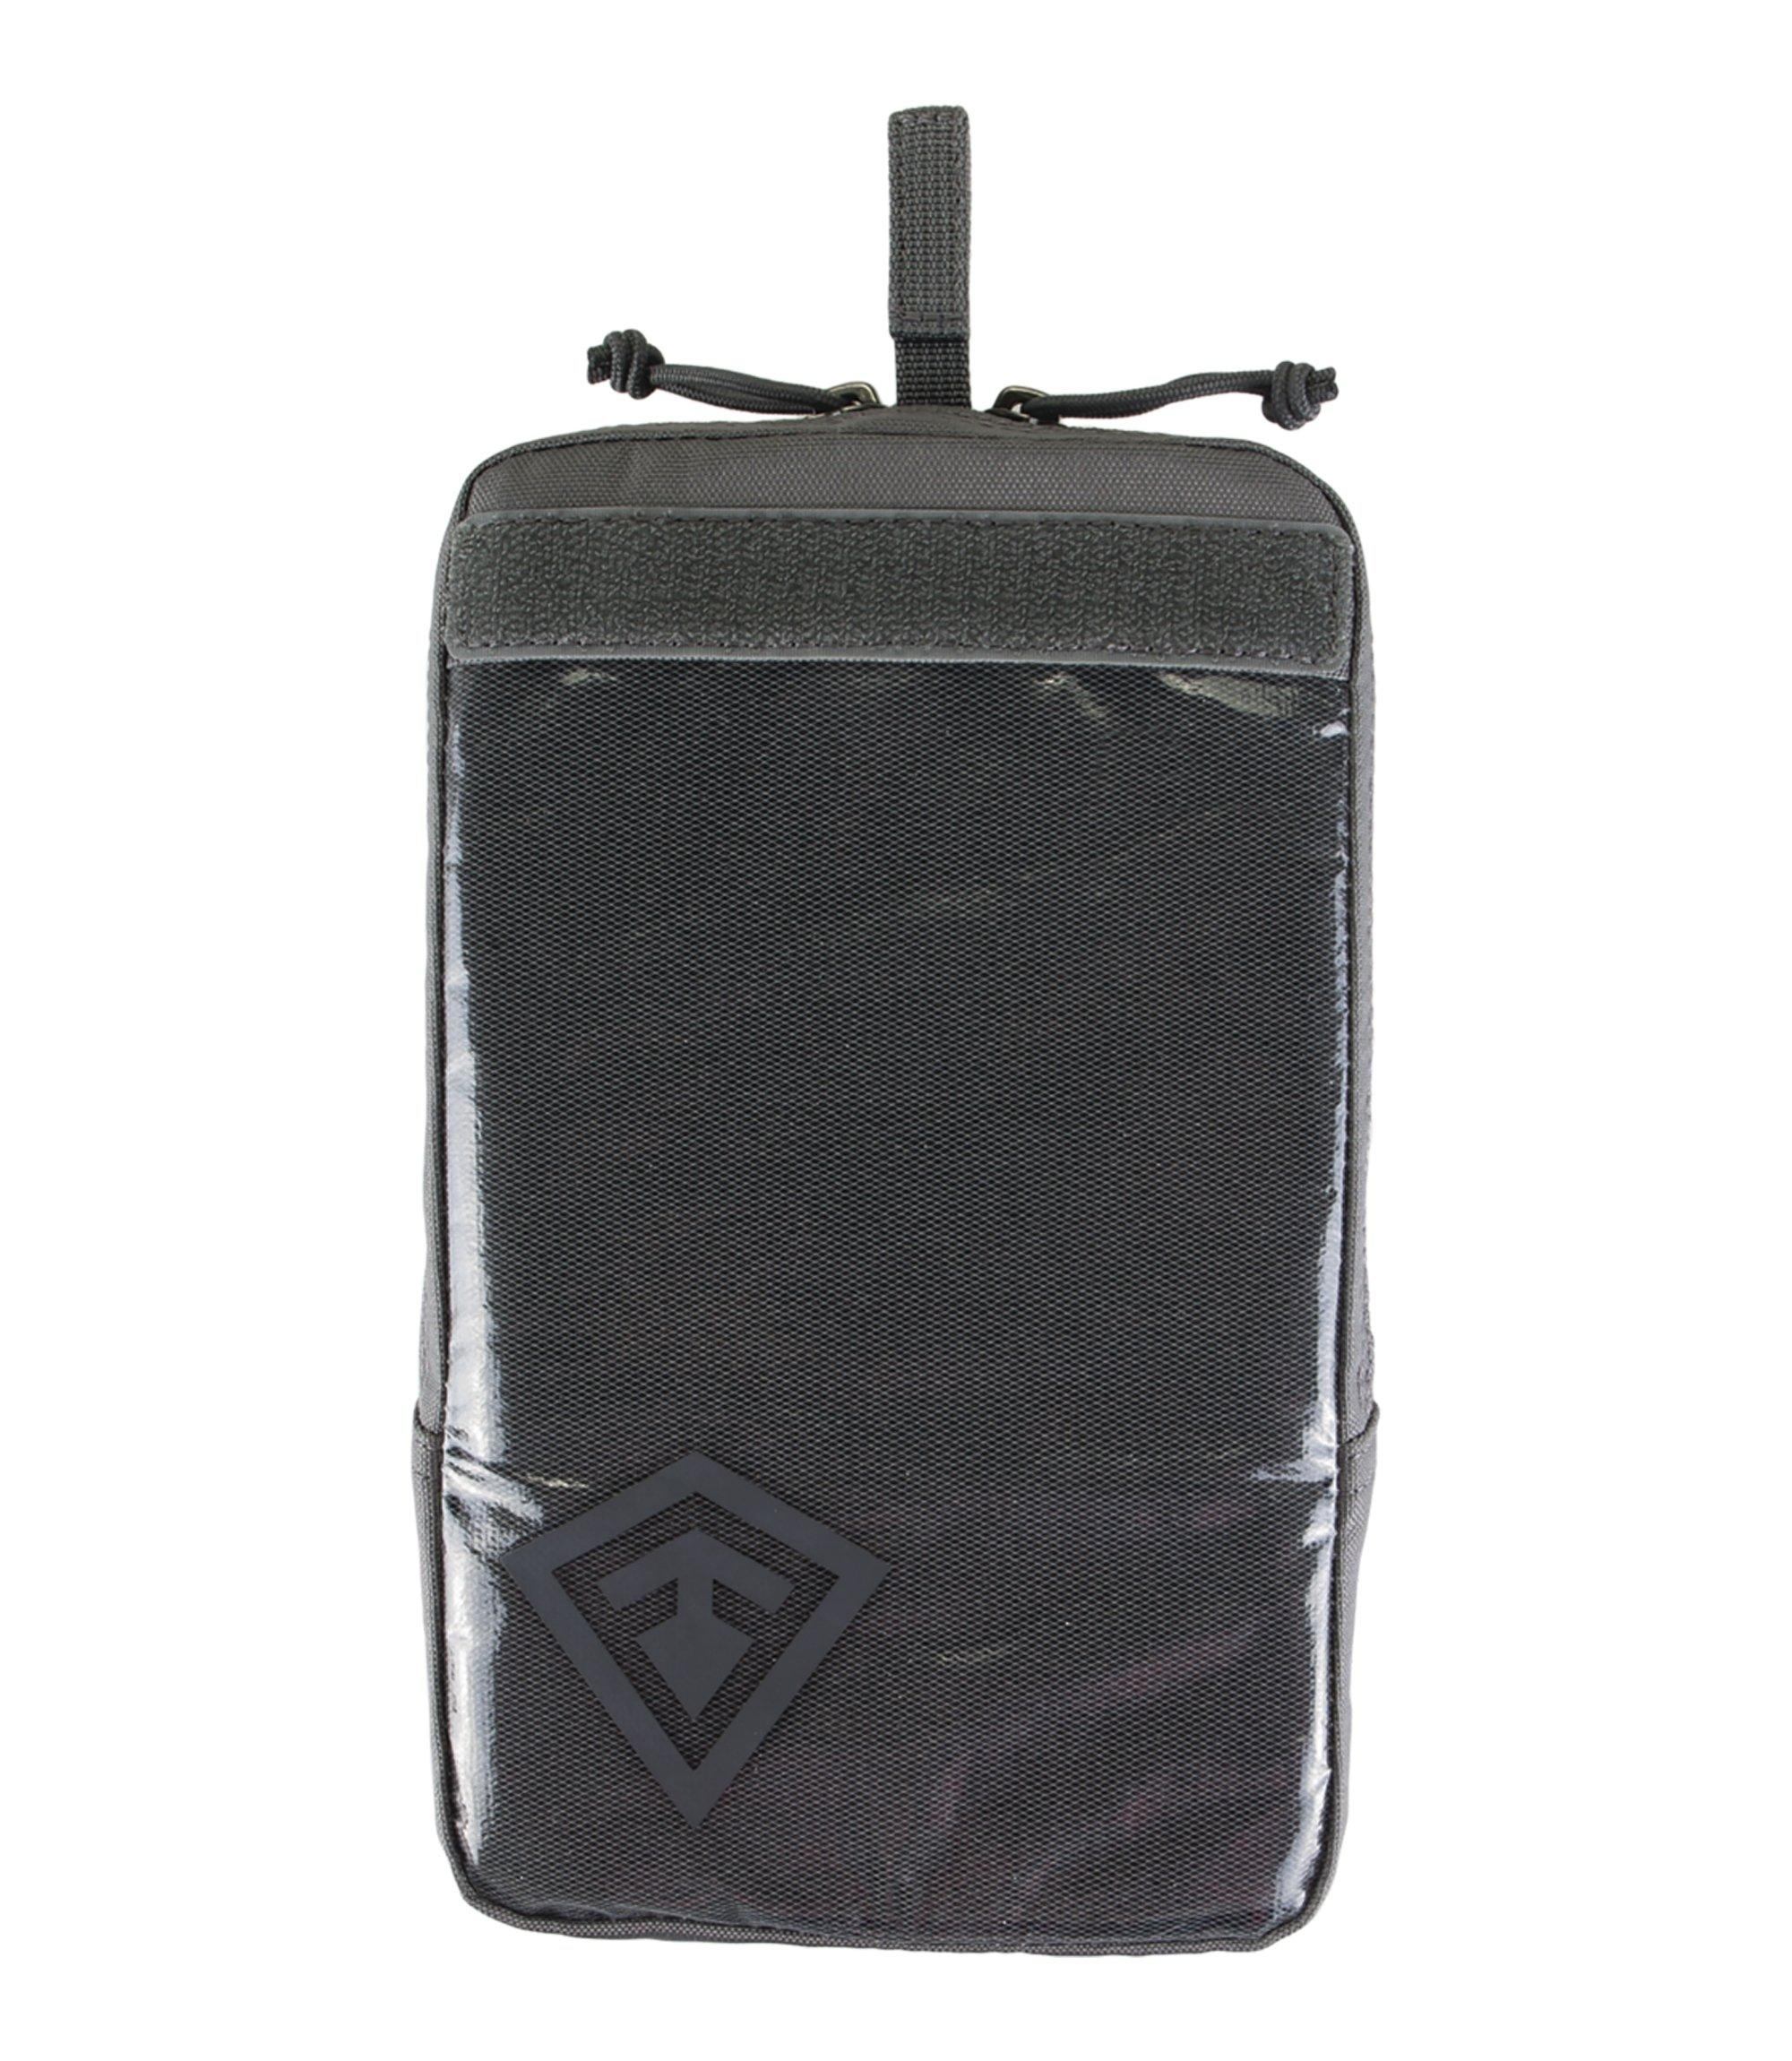 Image of Futerał first tactical 6x10 velcro pouch 180033 (u1t/180033 015)